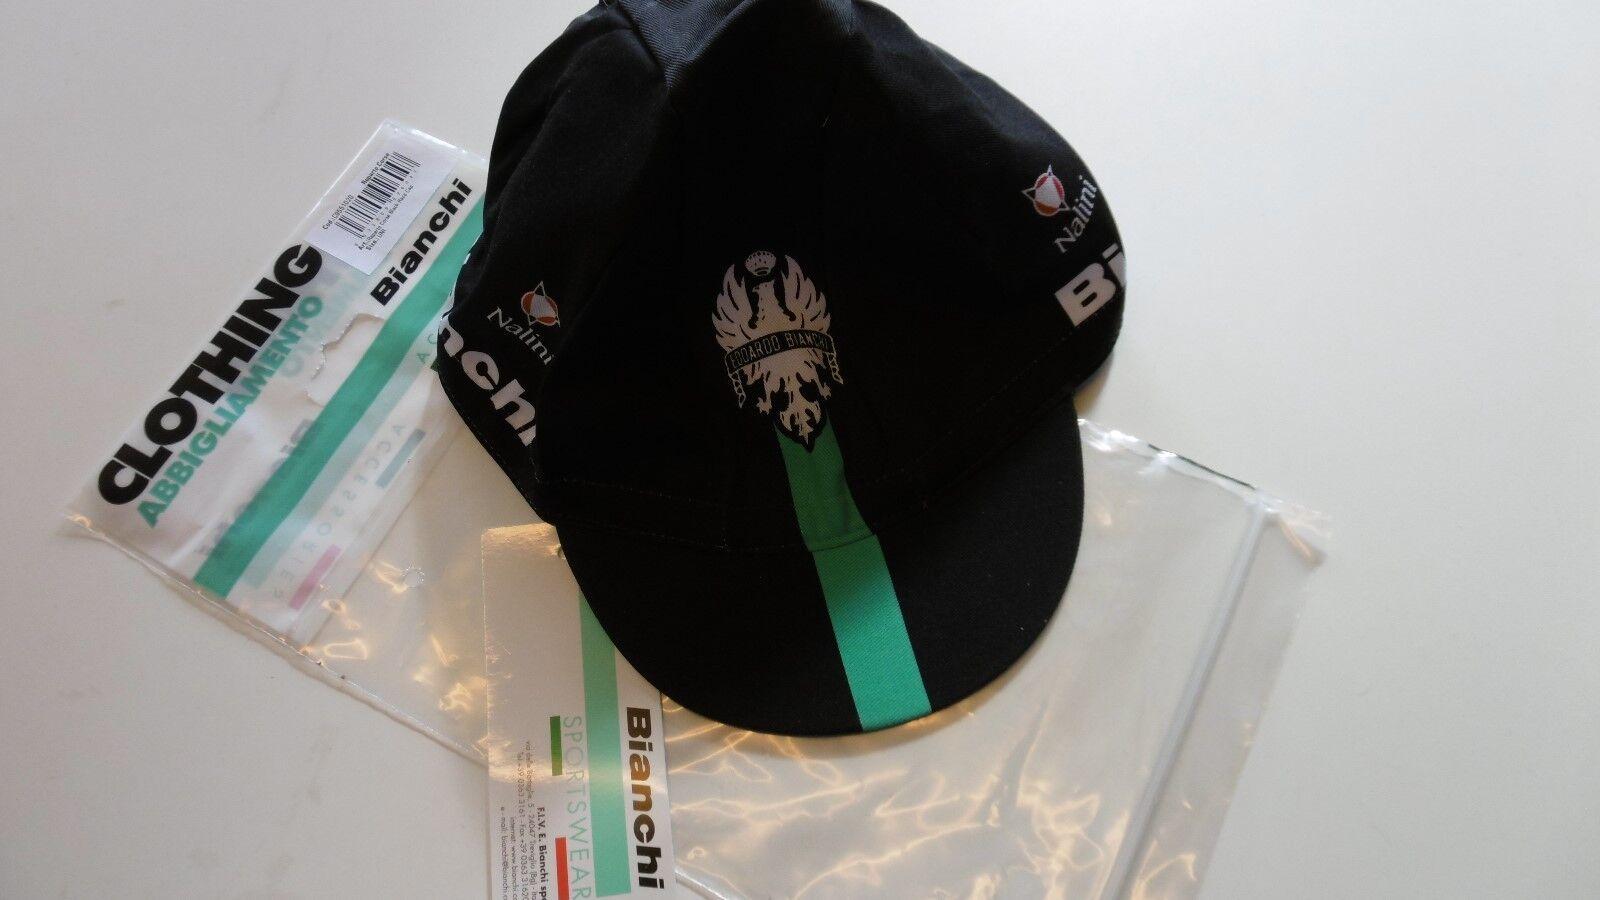 Bianchi Nalini Reparto Corsa Black Race Cycling Cap New In Bag Made In Italy